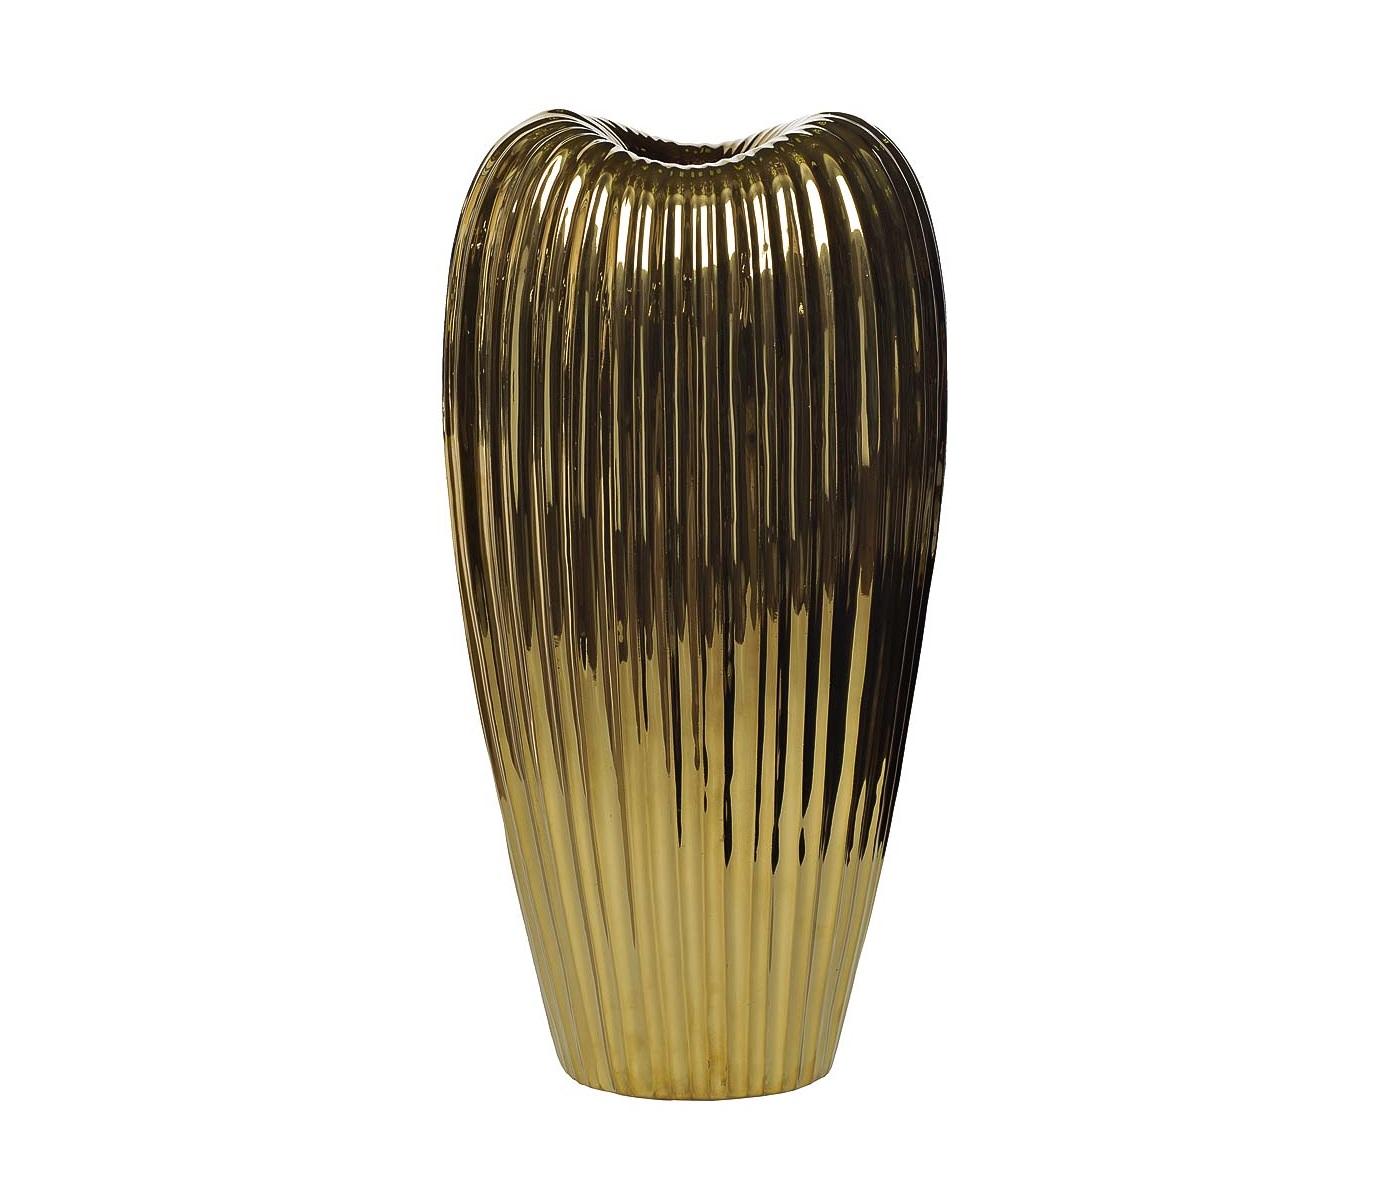 ВазаВазы<br><br><br>Material: Керамика<br>Ширина см: 22<br>Высота см: 43<br>Глубина см: 16